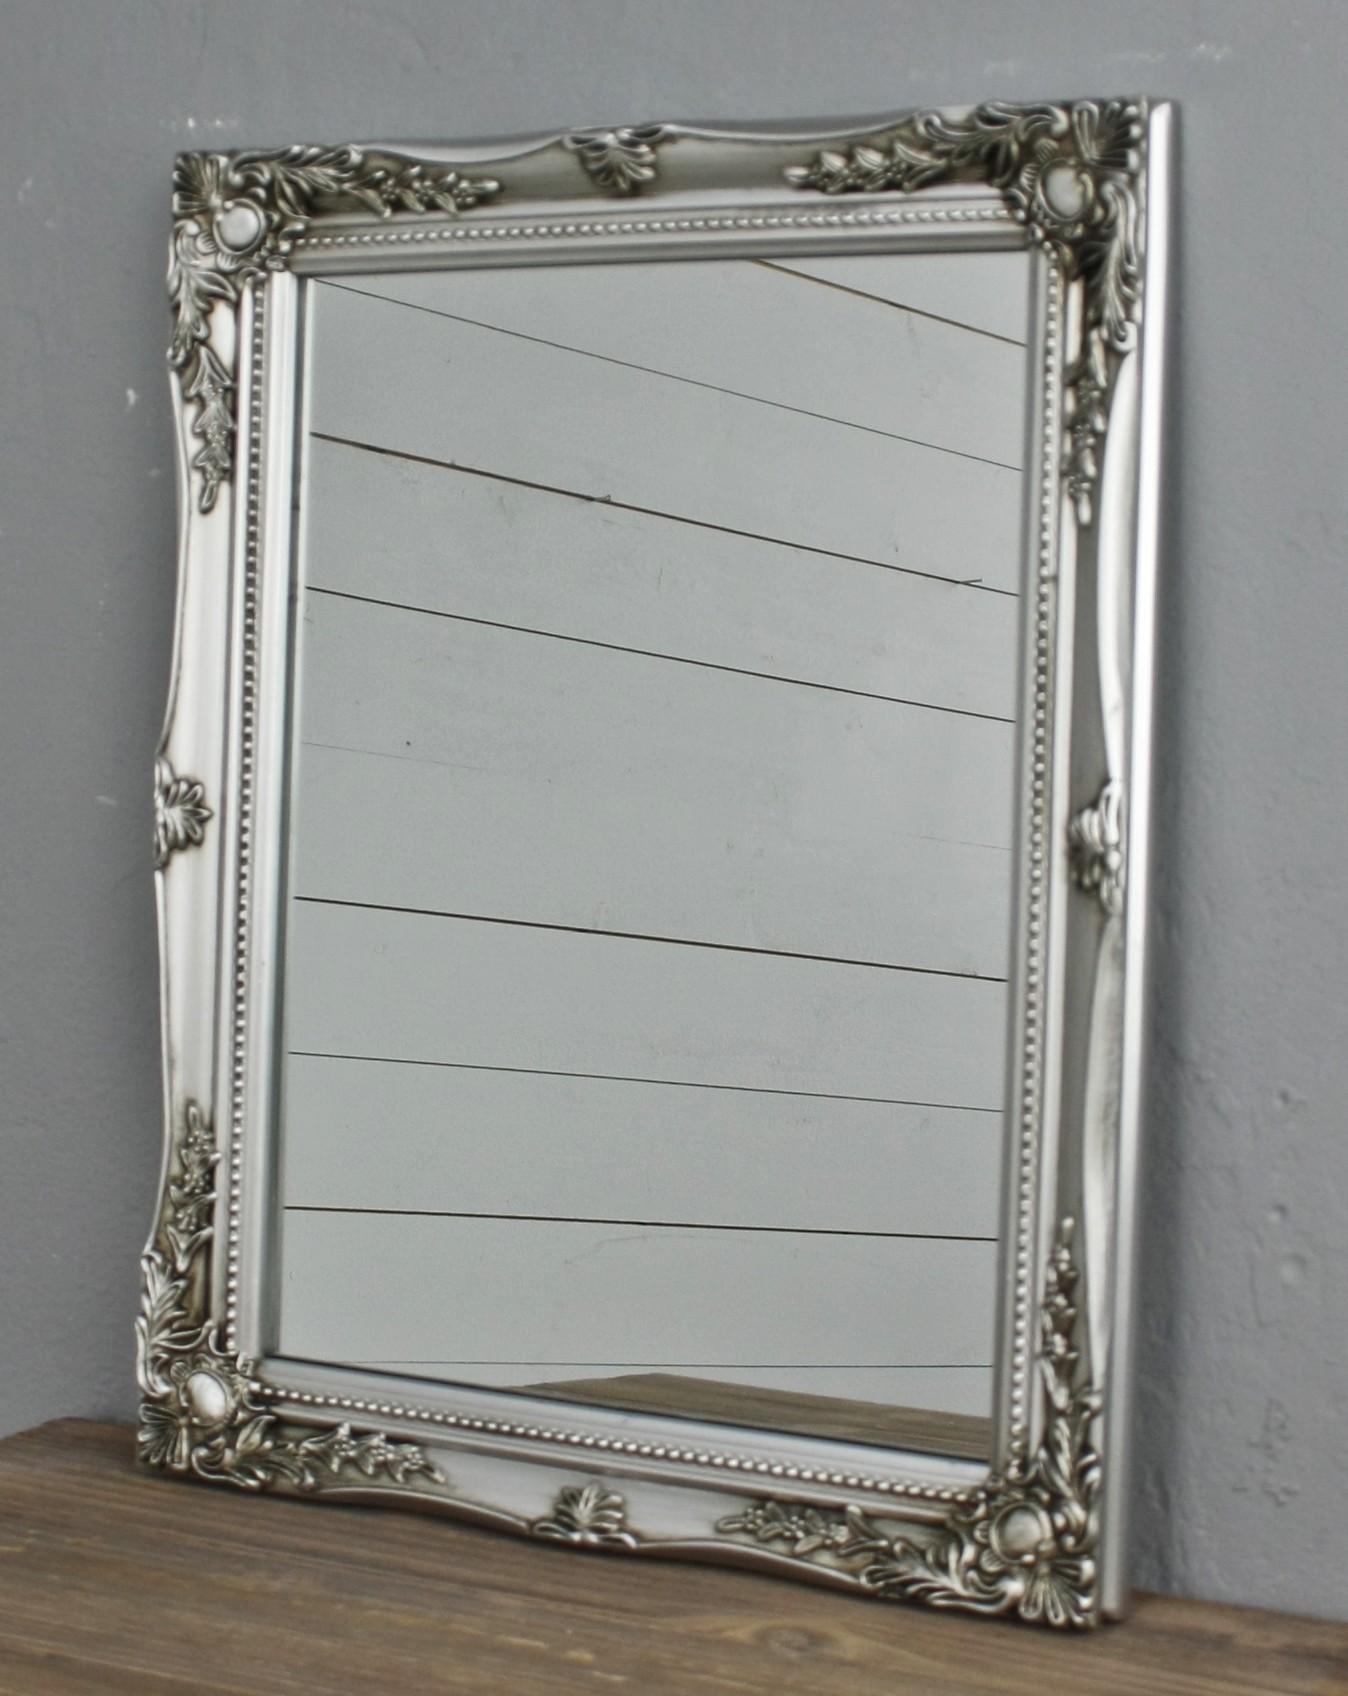 spiegel wandspiegel silber barock holz badspiegel landhaus. Black Bedroom Furniture Sets. Home Design Ideas